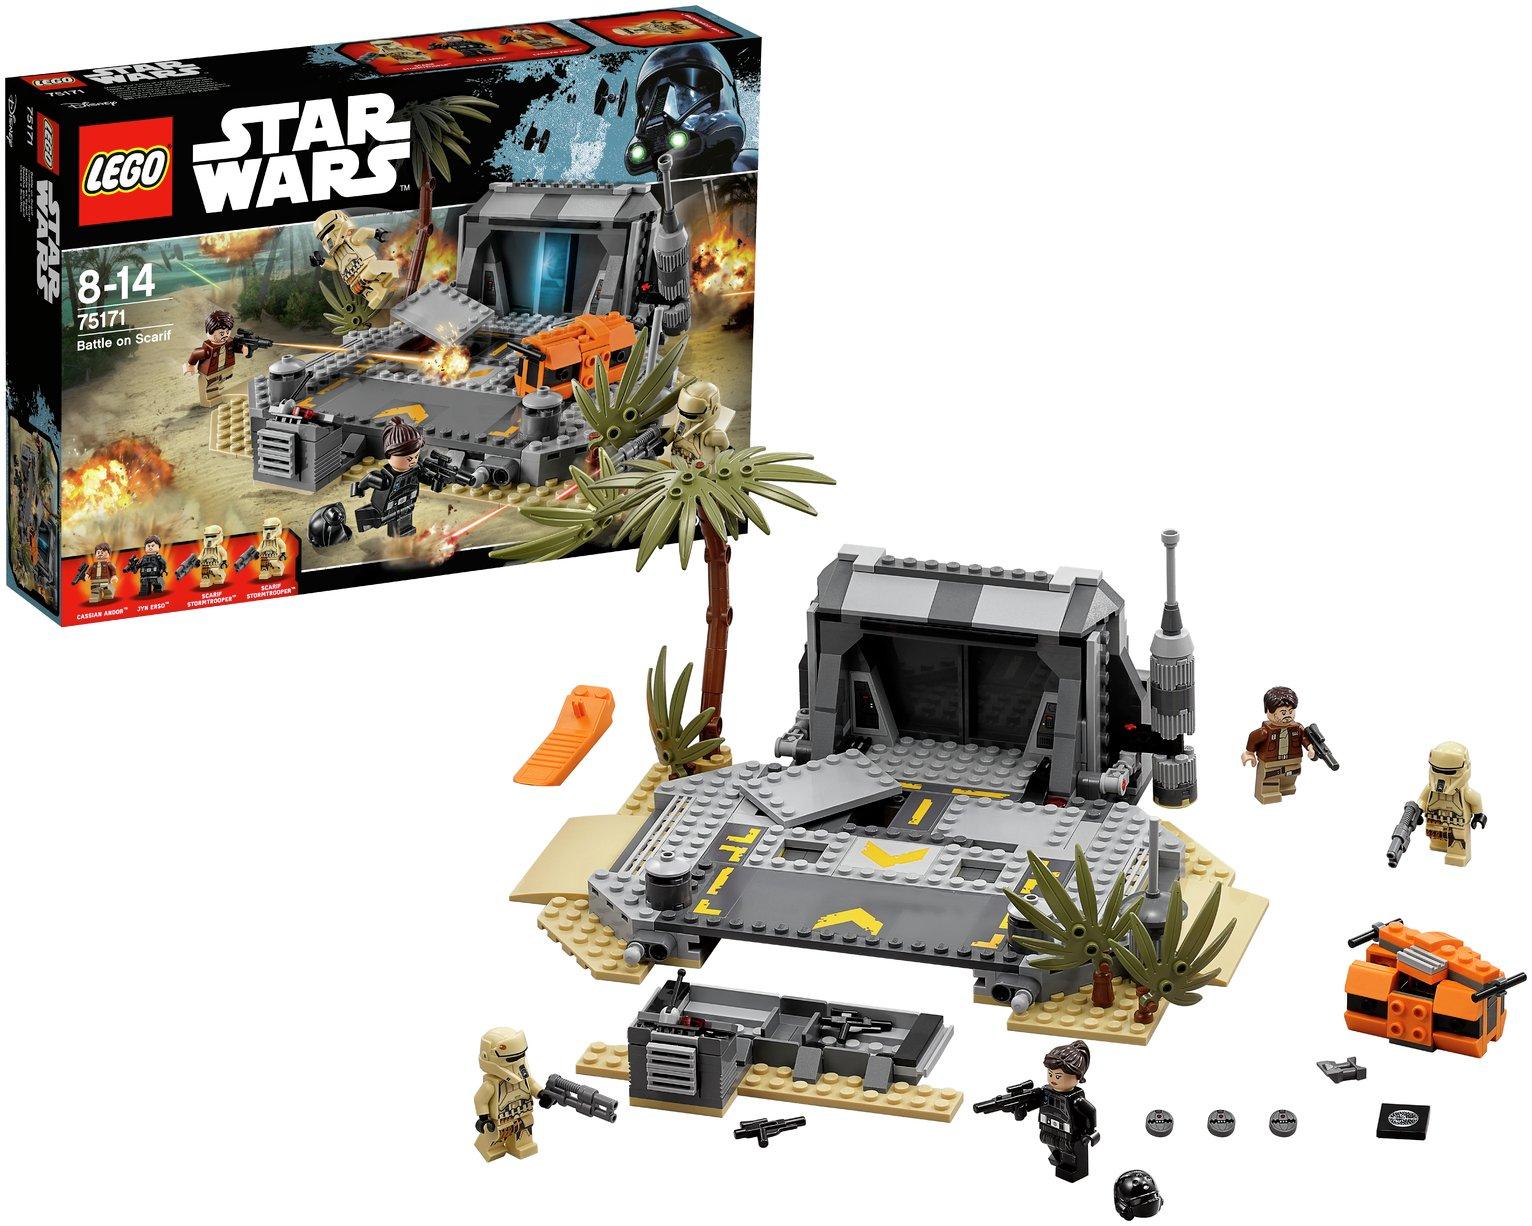 lego-star-wars-battle-on-scarif-75171